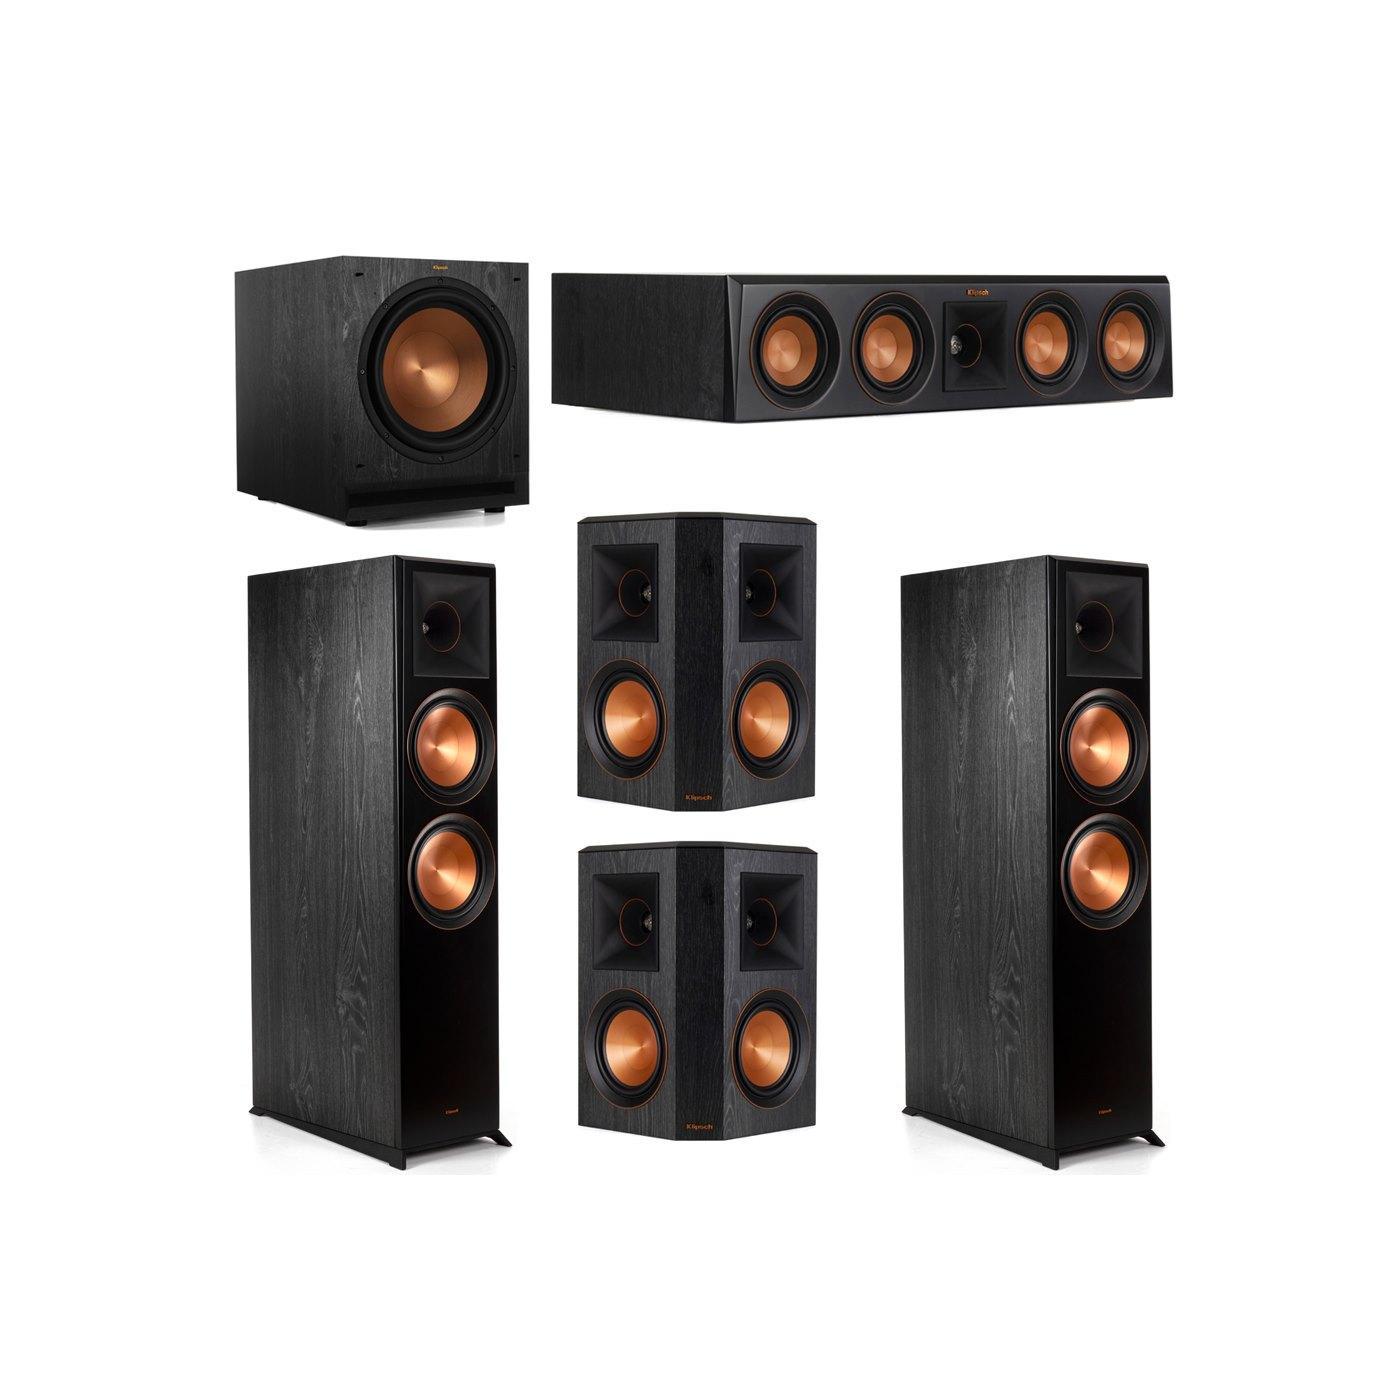 Klipsch 5.1 System with 2 RP-8000F Floorstanding Speakers, 1 Klipsch RP-404C Center Speaker, 2 Klipsch RP-502S Surround Speakers, 1 Klipsch SPL-120 Subwoofer